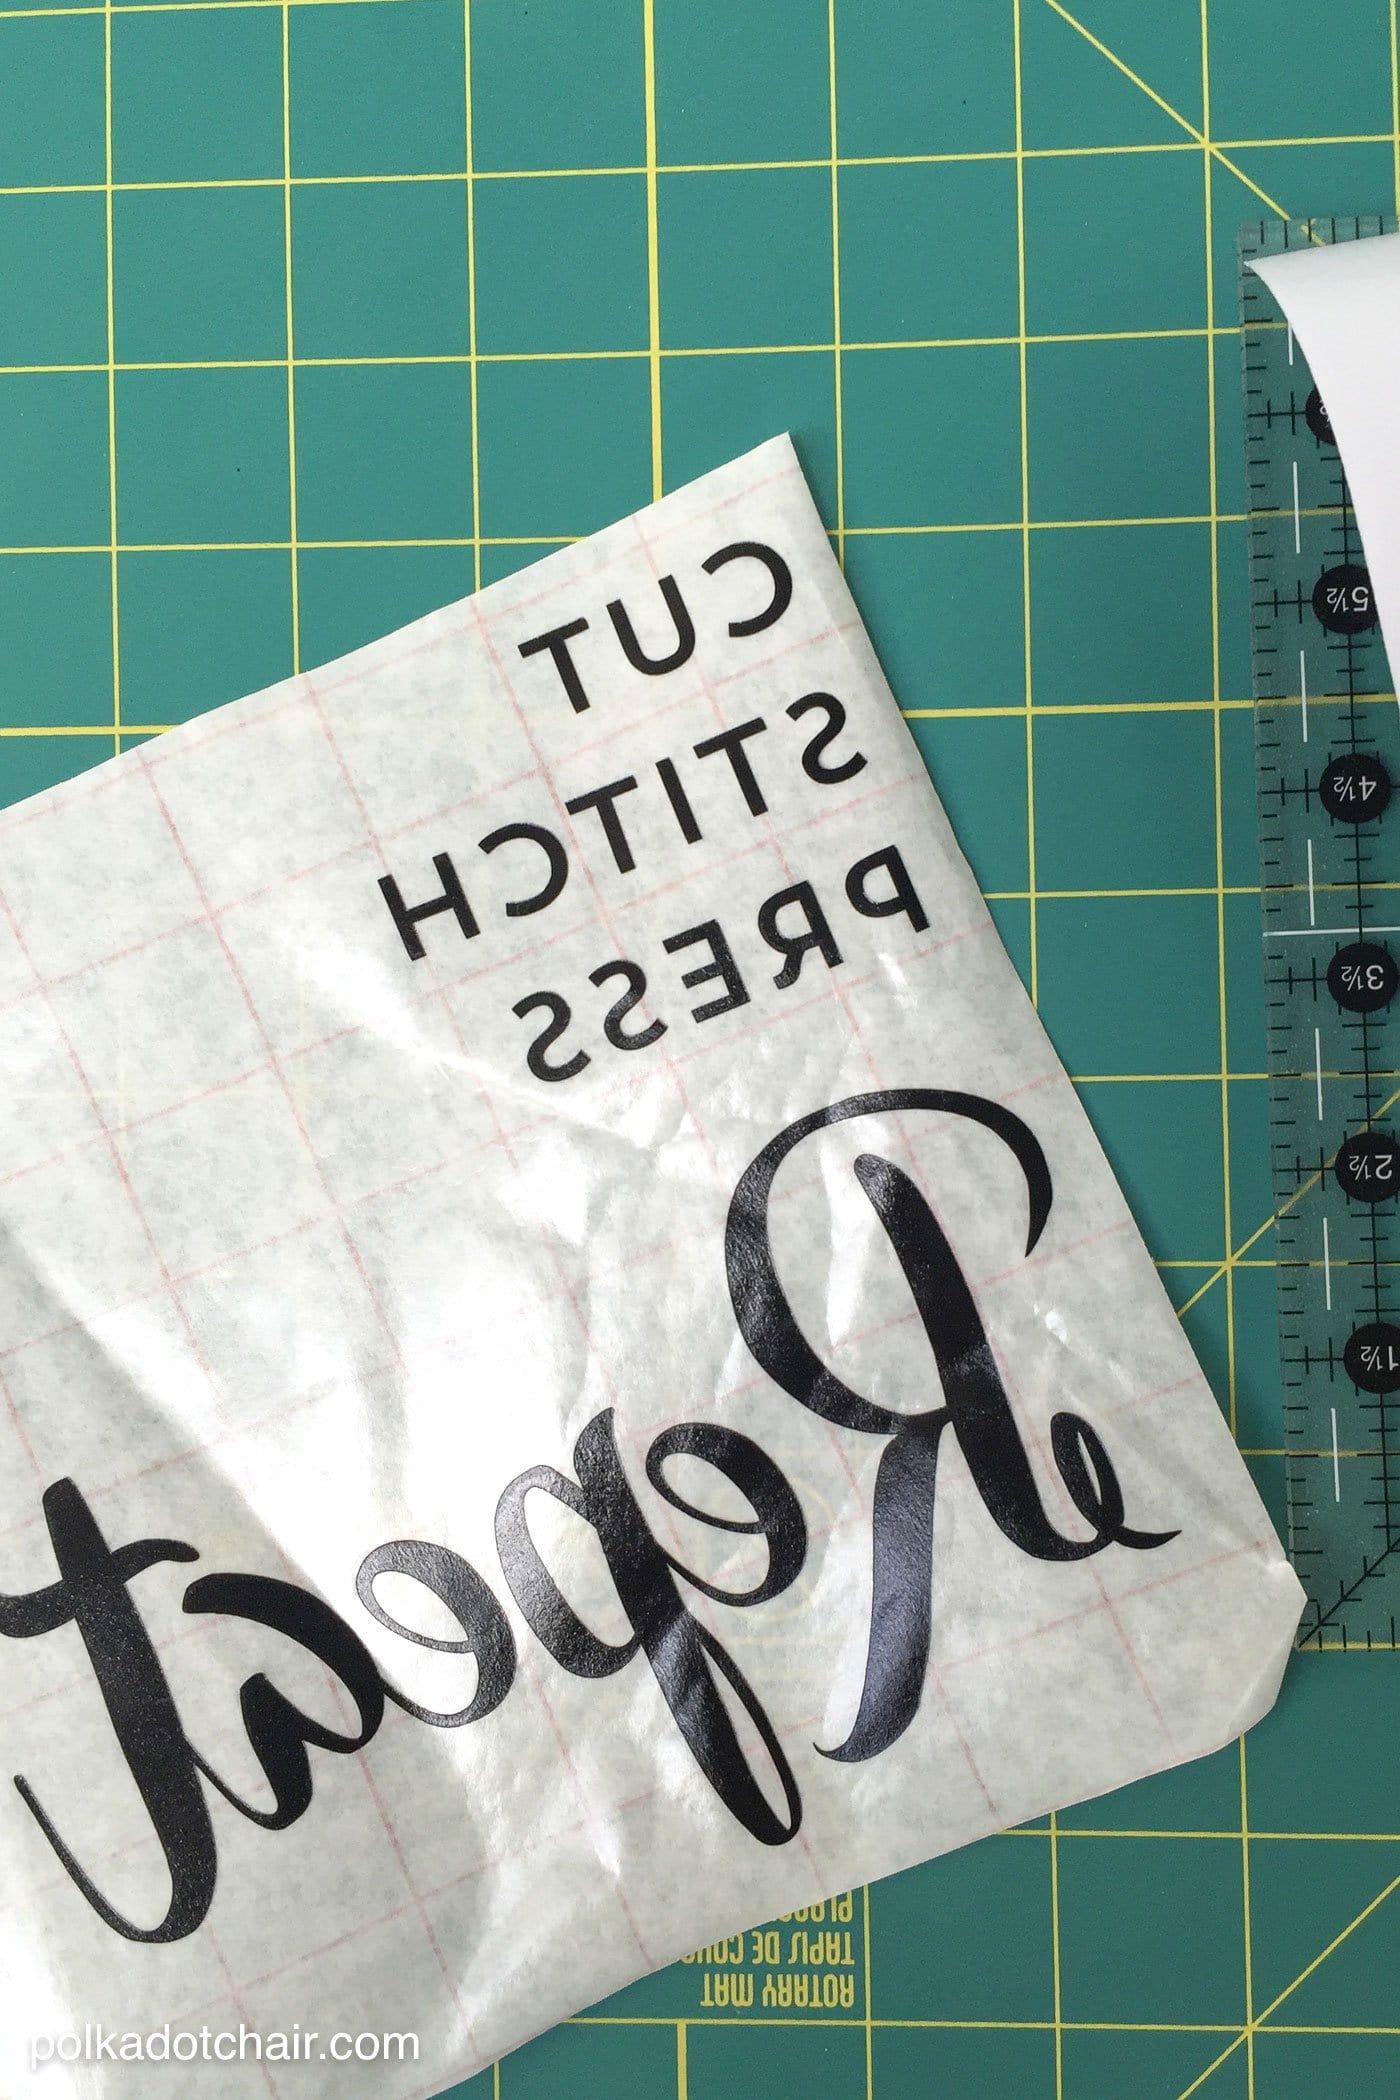 DIY Sewing Room Decor Ideas {and free Cricut Cut Files} - The Polka ...